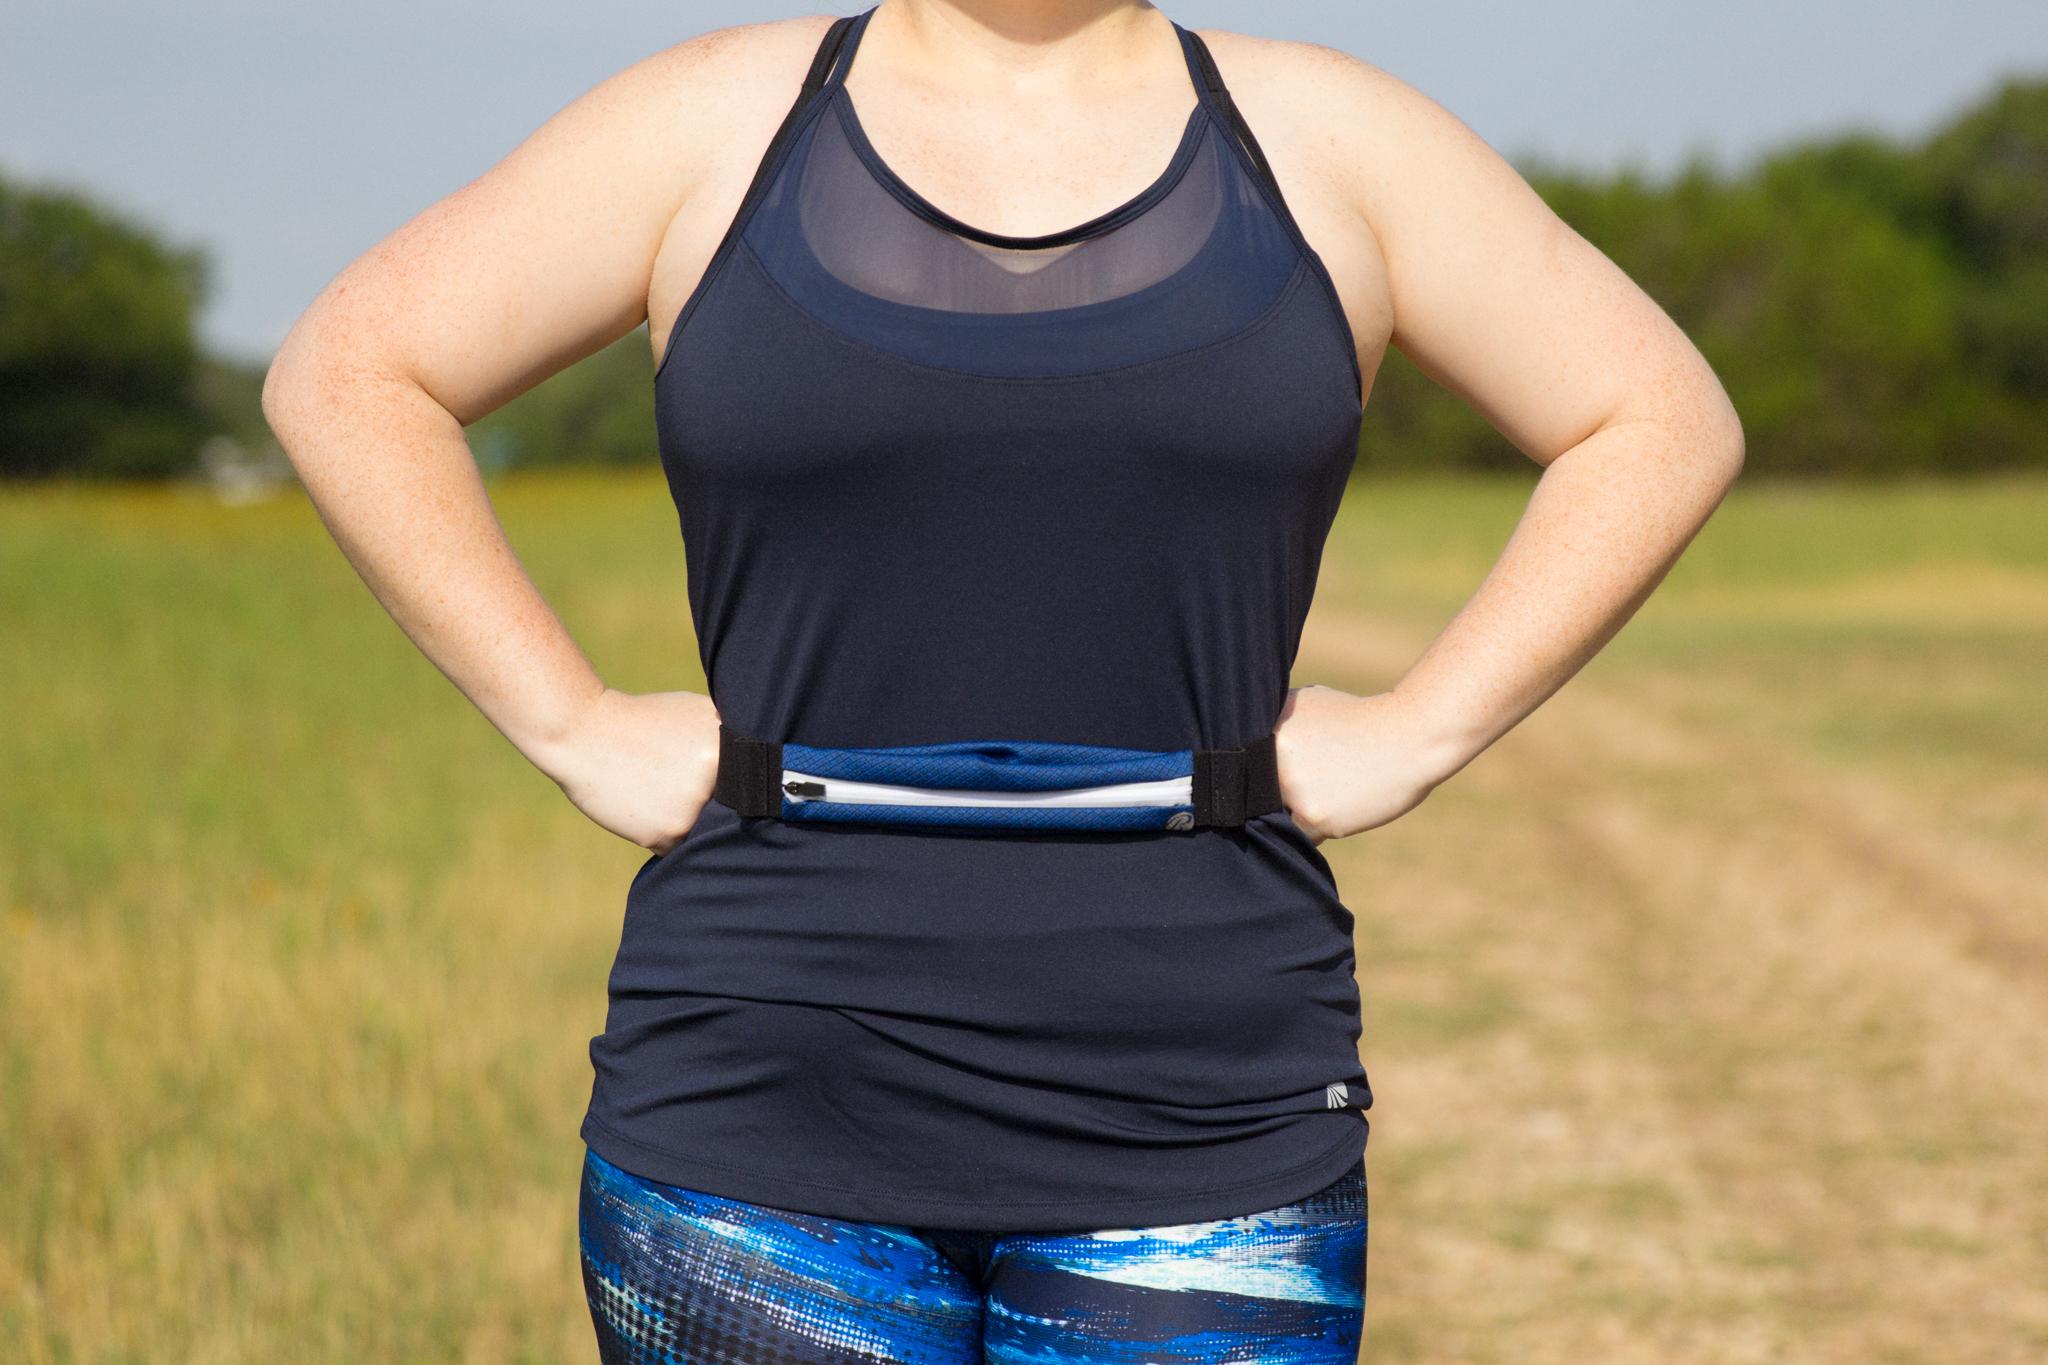 Ellie-Activewear-June-Box-Unboxing-the-Glam-5.jpg